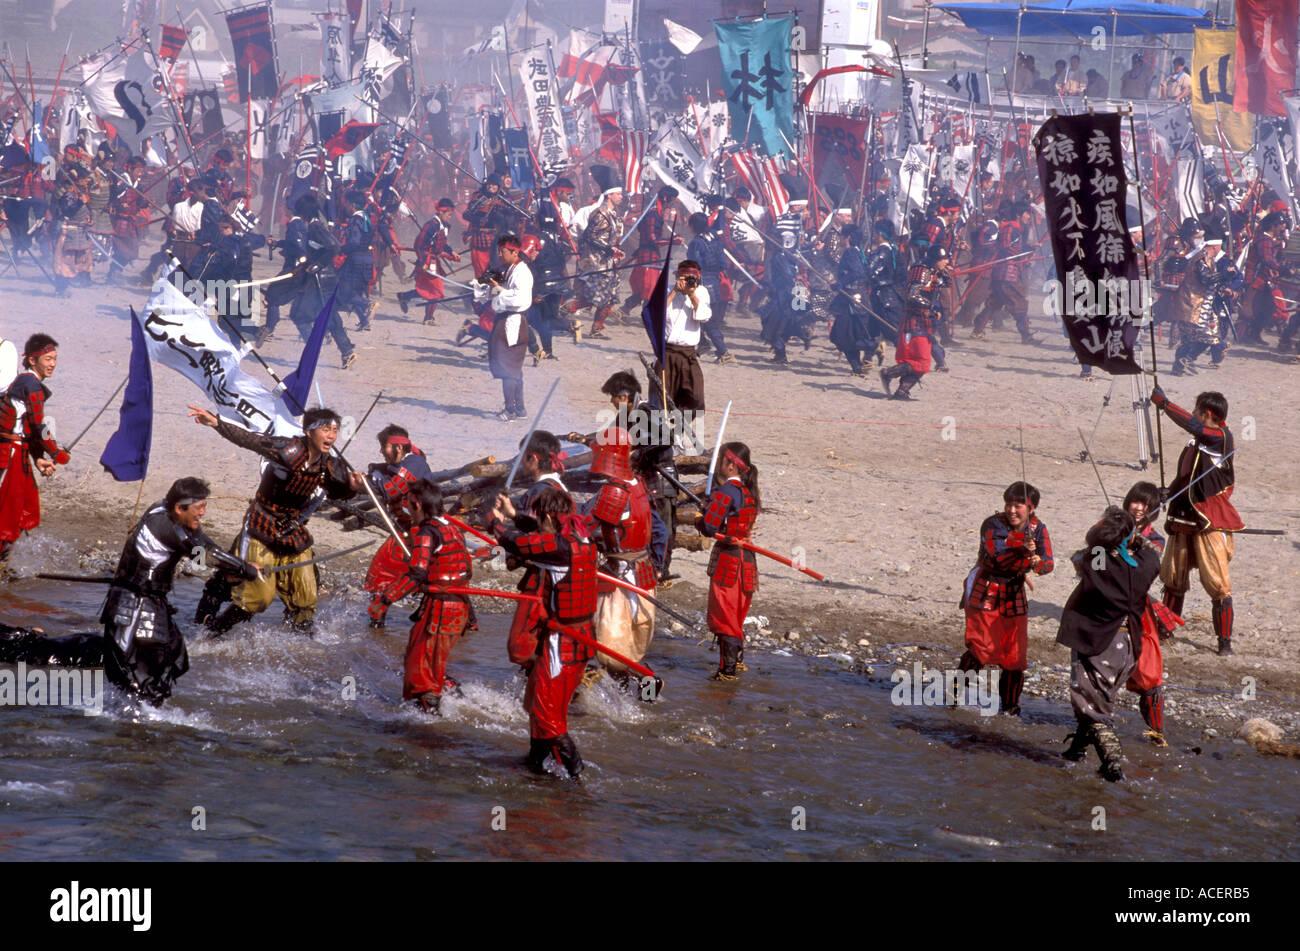 Samurai clans clash in reenactment of famous battle scene called Kawanakajima No Kassen in Isawa Onsen - Stock Image